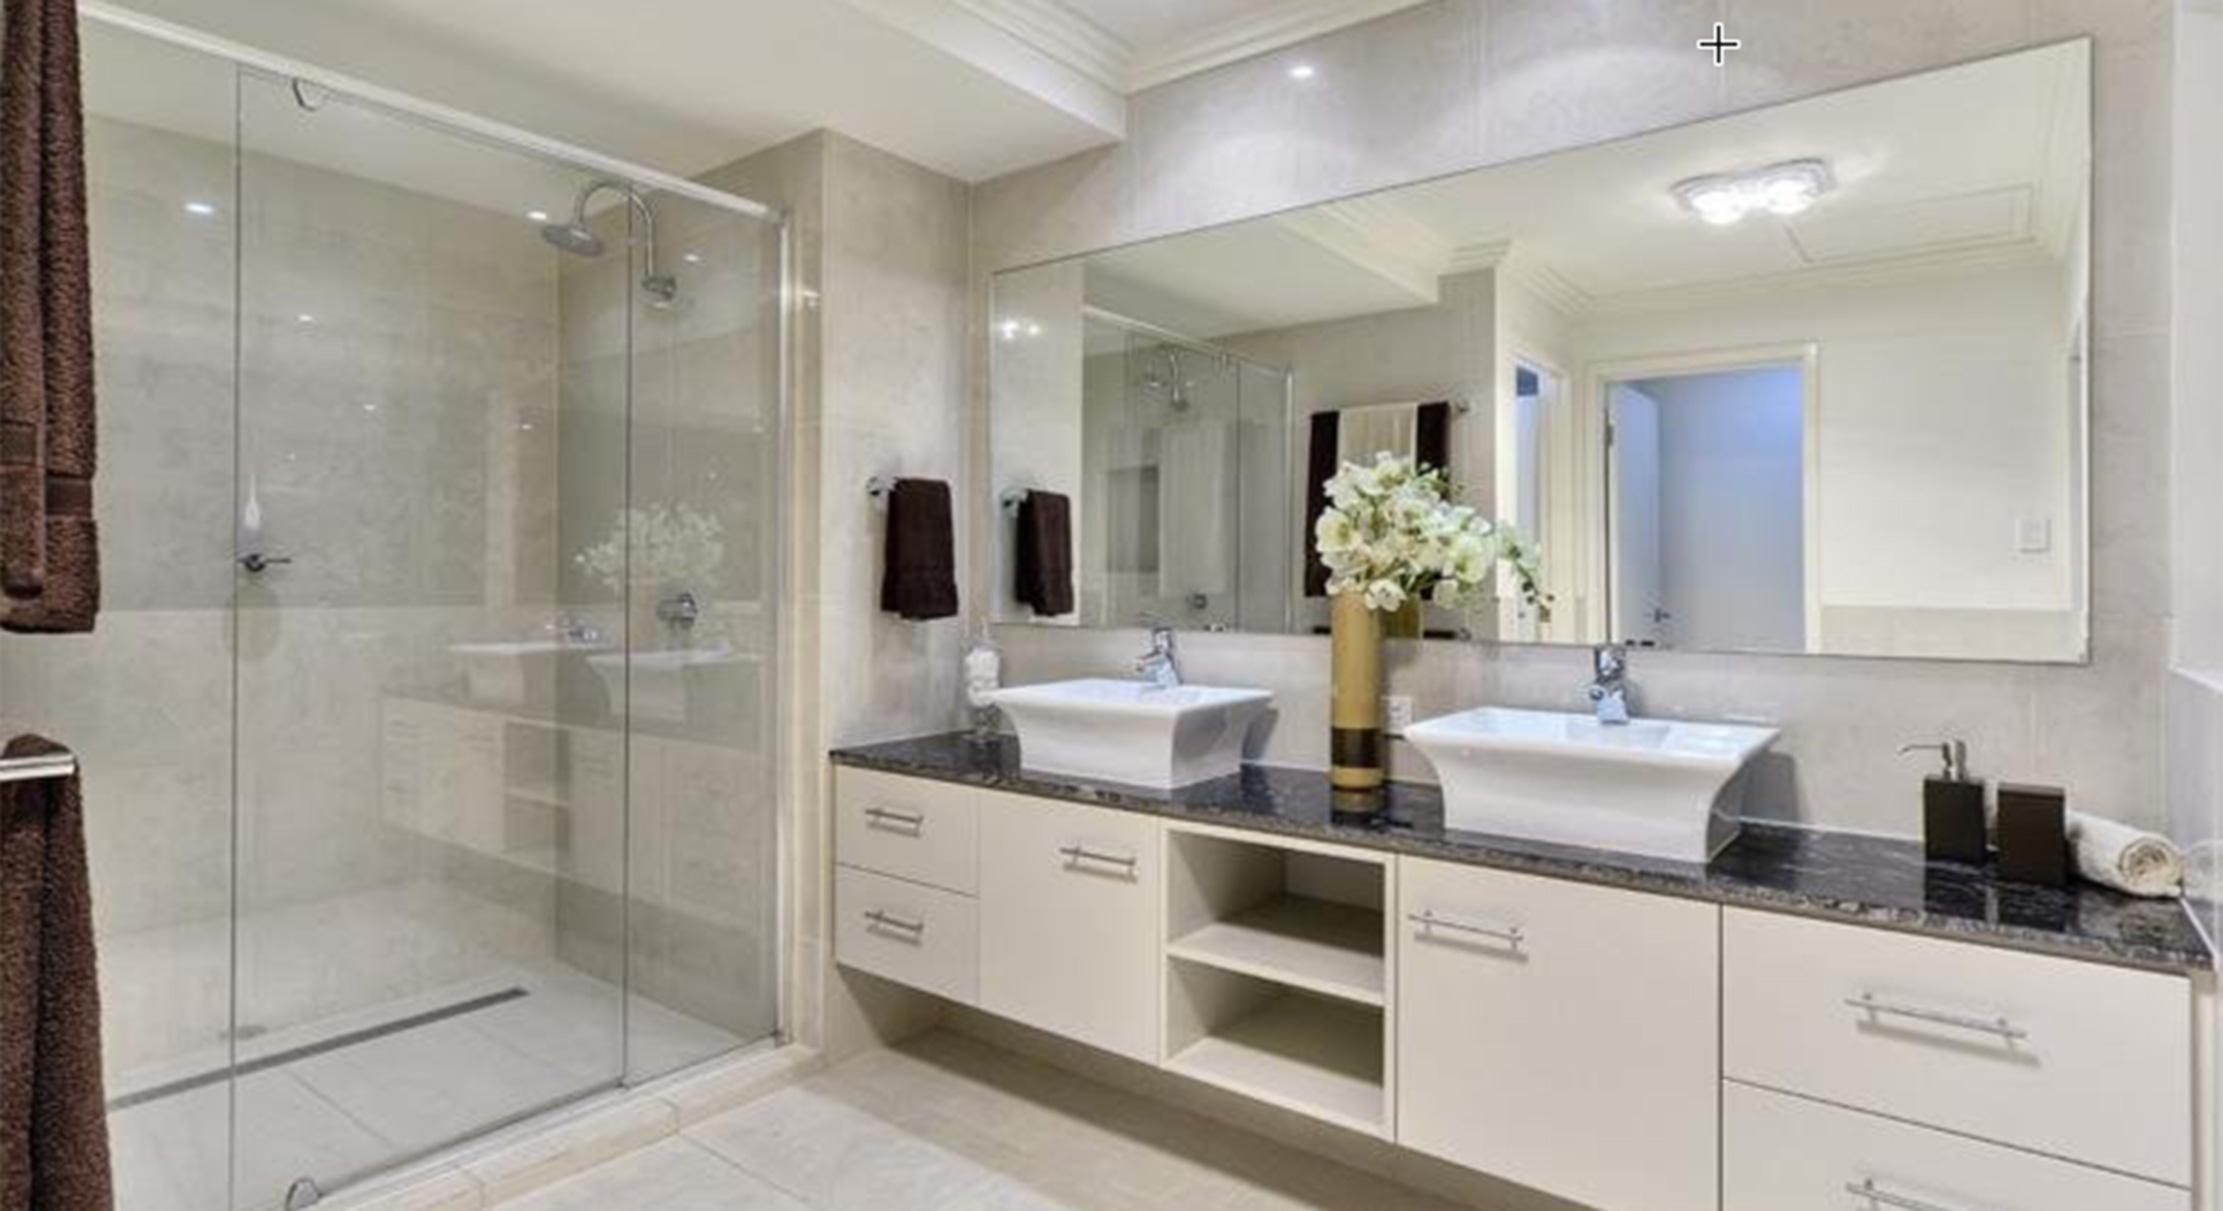 portfolio-2-slider-image-2-bathroom-newmarket-gary-cramb-constructions-brisbane